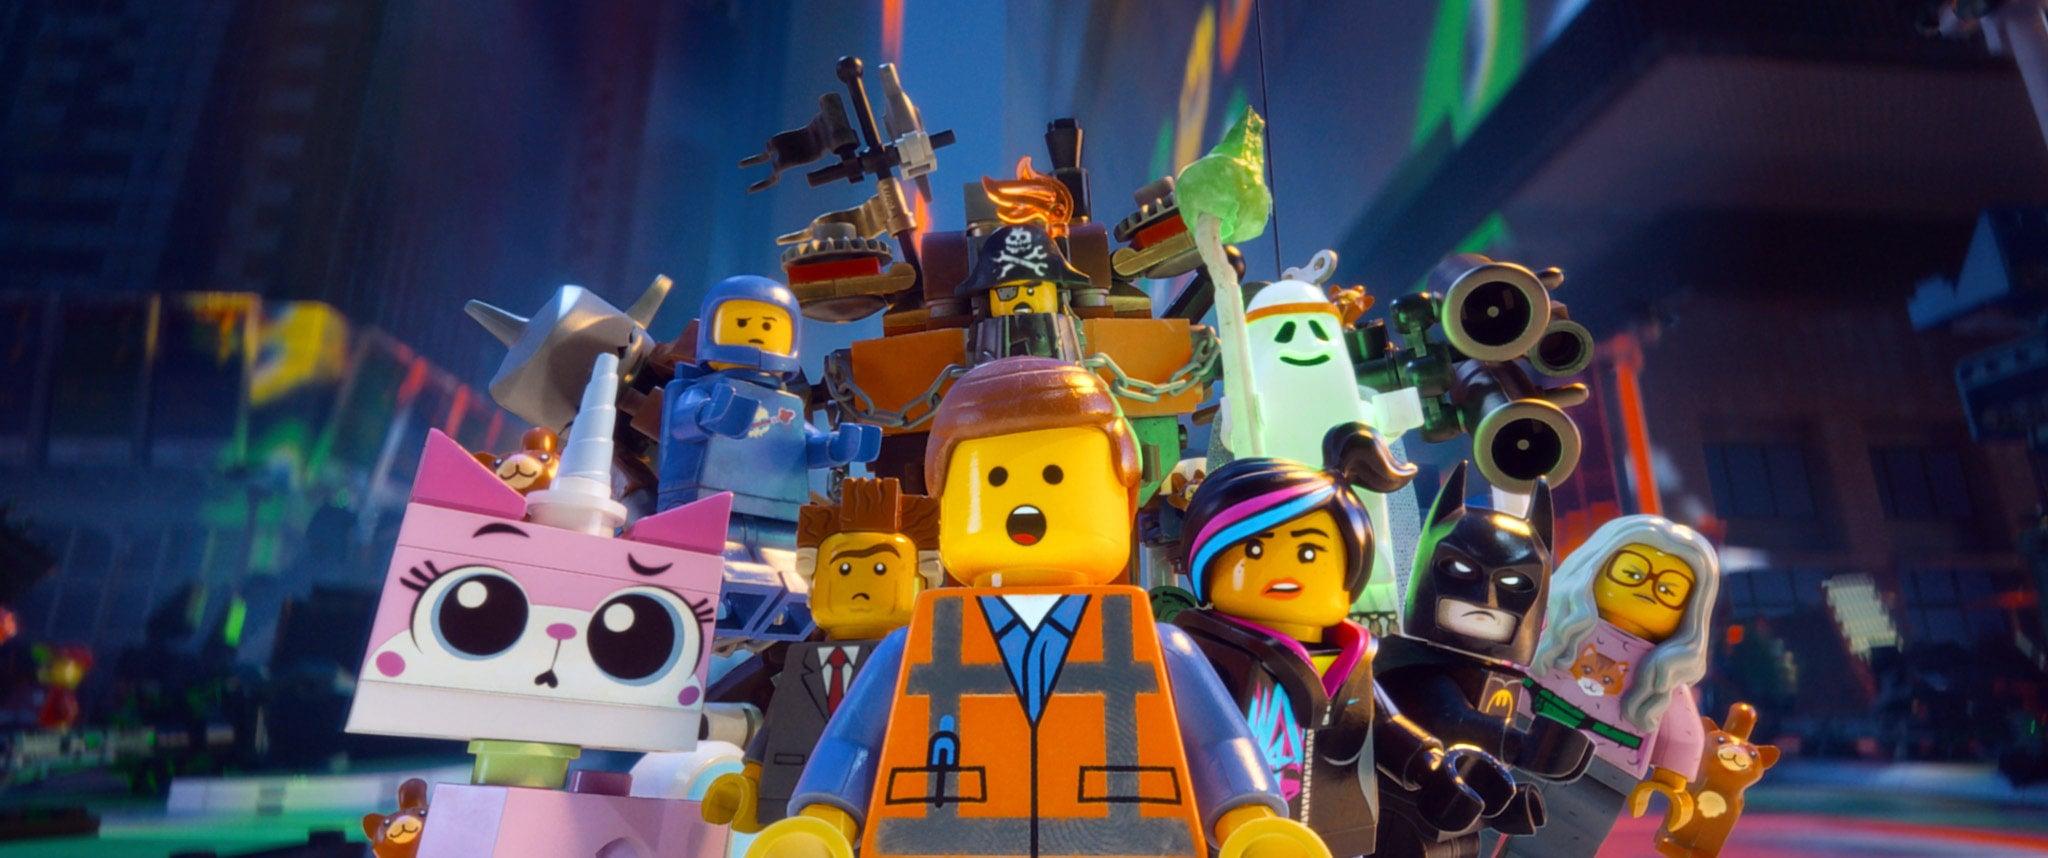 THE LEGO MOVIE, Unikitty (voice: Alison Brie), Benny (voice: Charlie Day), Metal Beard (Nick Offerman), Vitruvius (voice: Morgan Freeman), Batman (voice: Will Arnett), Wyldstyle (voice: Elizabeth Banks), Emmet (voice: Chris Pratt), President Business (voice: Will Ferrell), 2014. Warner Bros. Pictures/courtesy Everett Collection